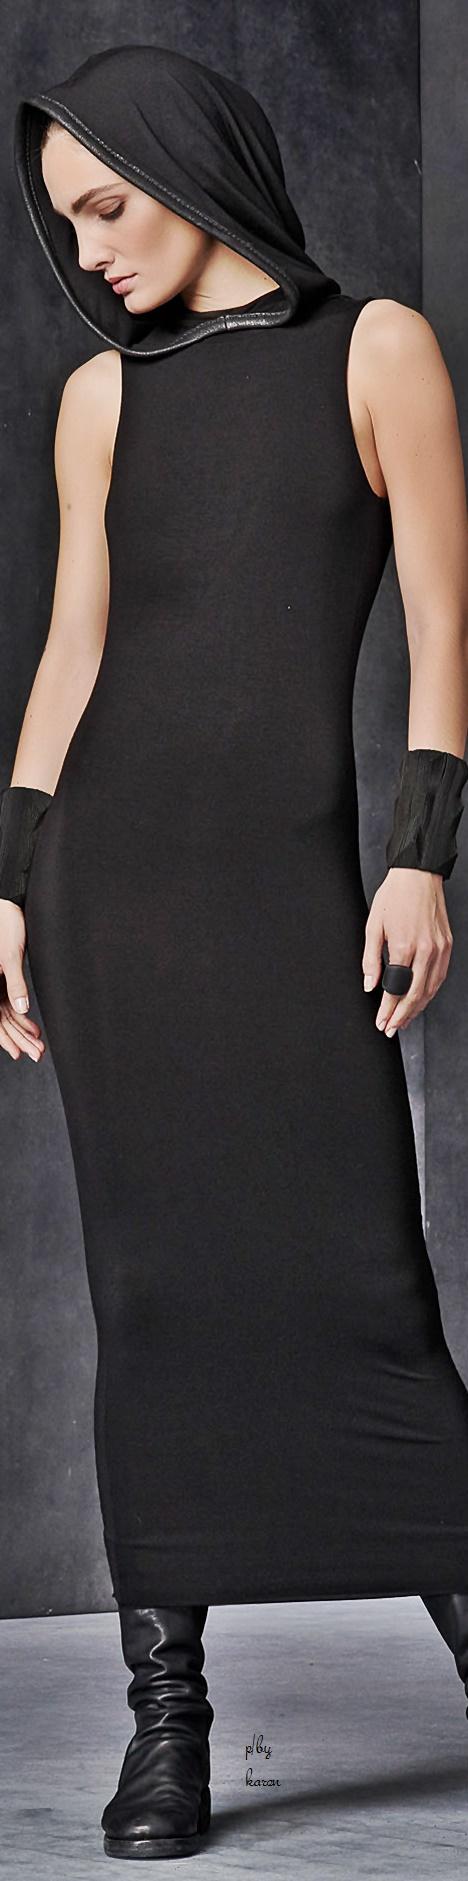 Black Leather Trimmed Hooded Sleeveless Dress